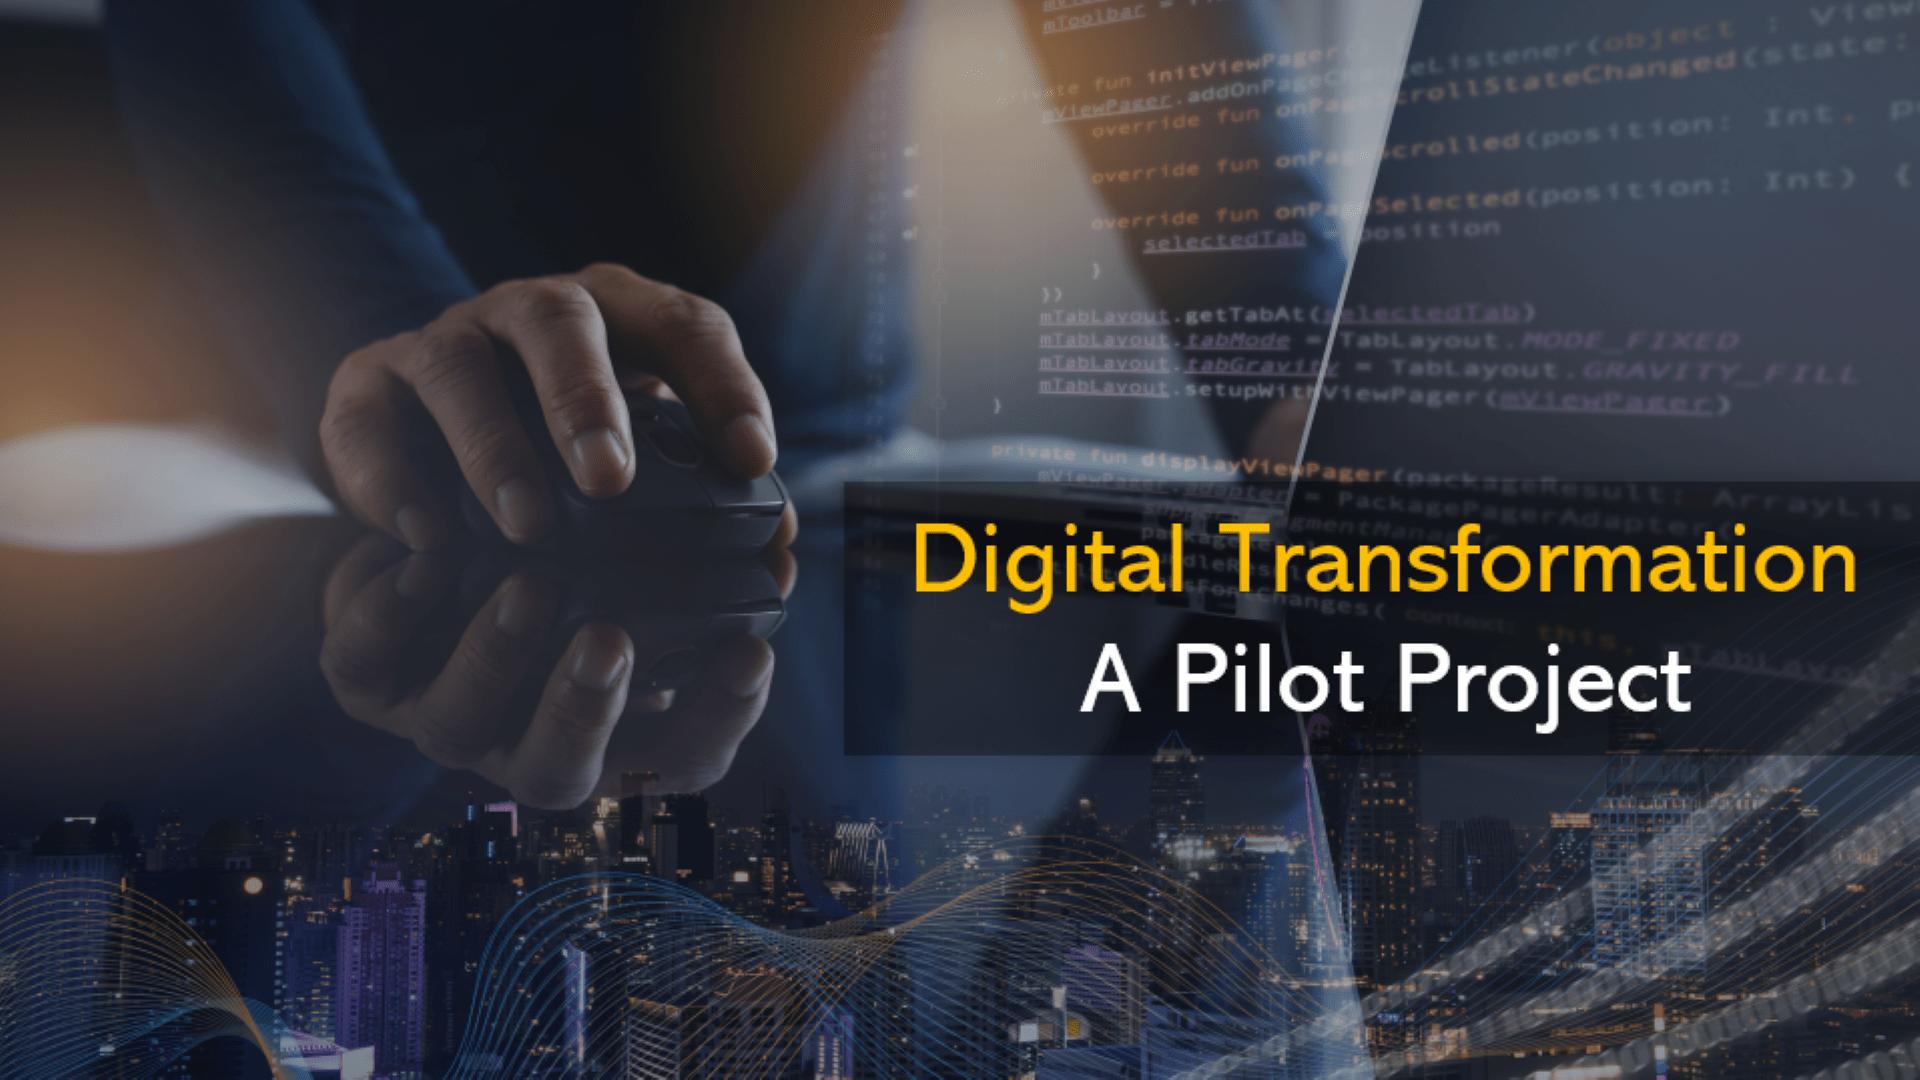 Digital Transformation: A Pilot Project